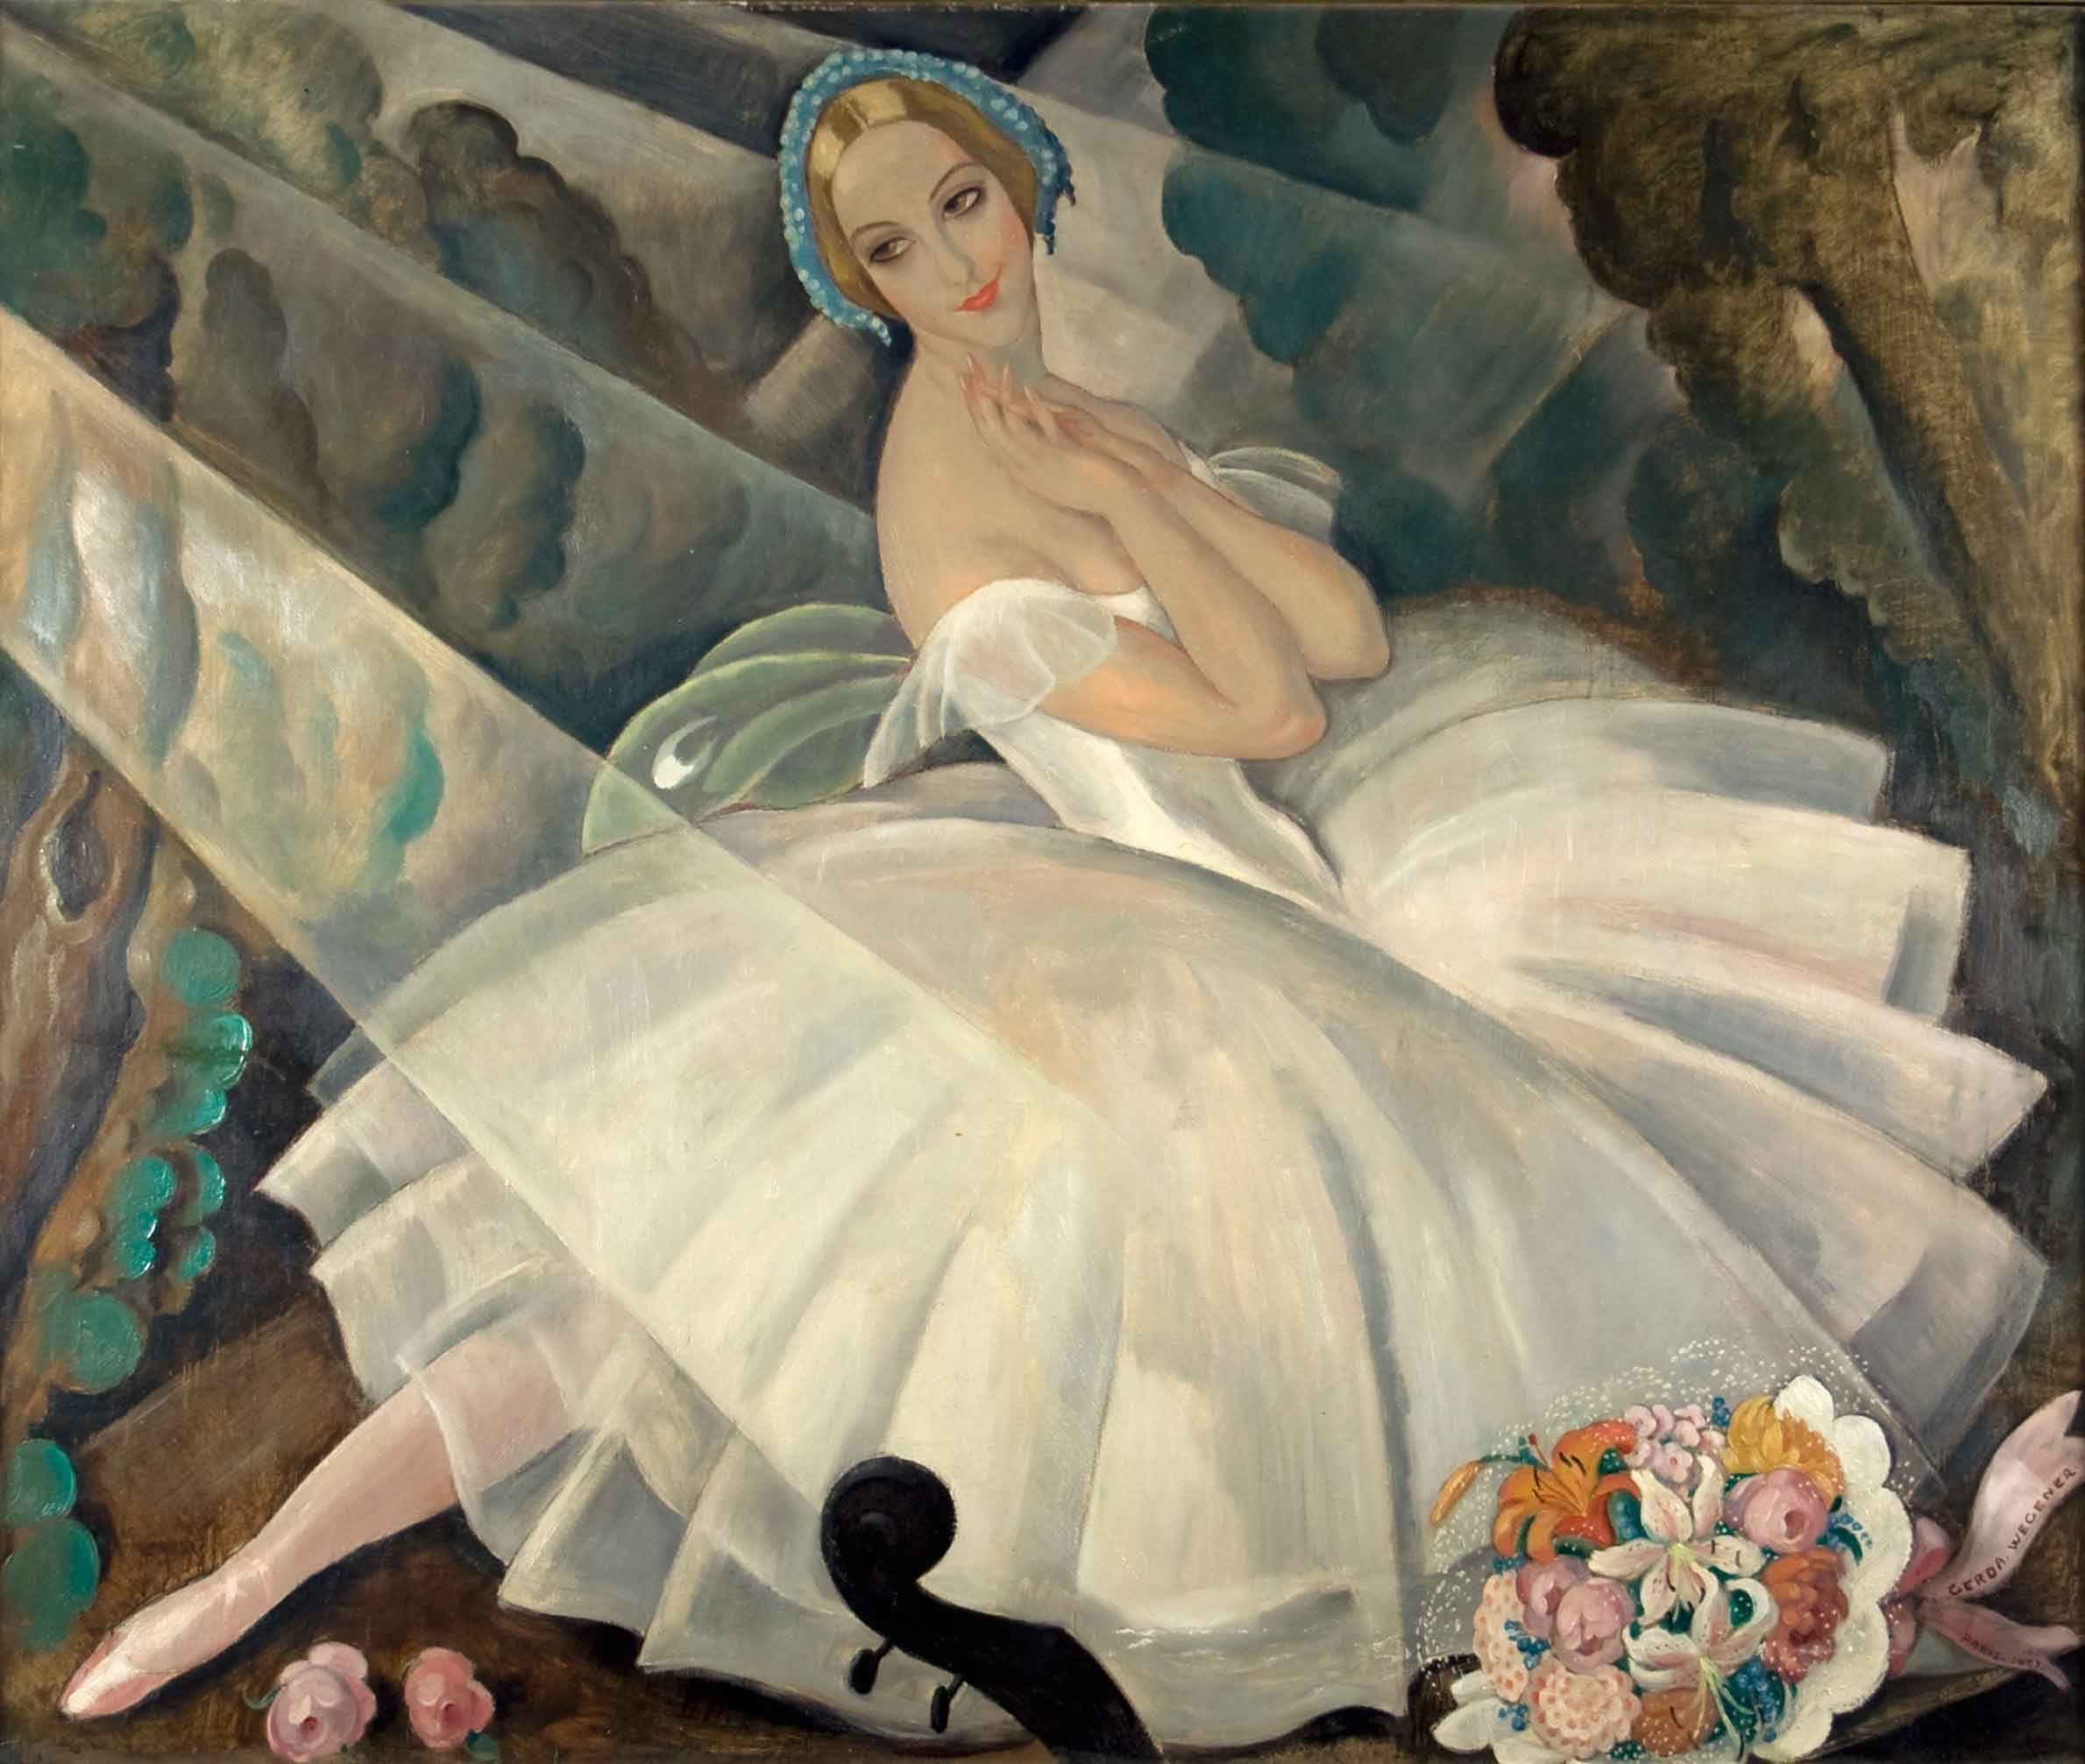 Ballet Chopiniana By Gerda Wegener In 1927 Photograph Public Domain Gerda Wegener Paintings Painting Of Girl Art